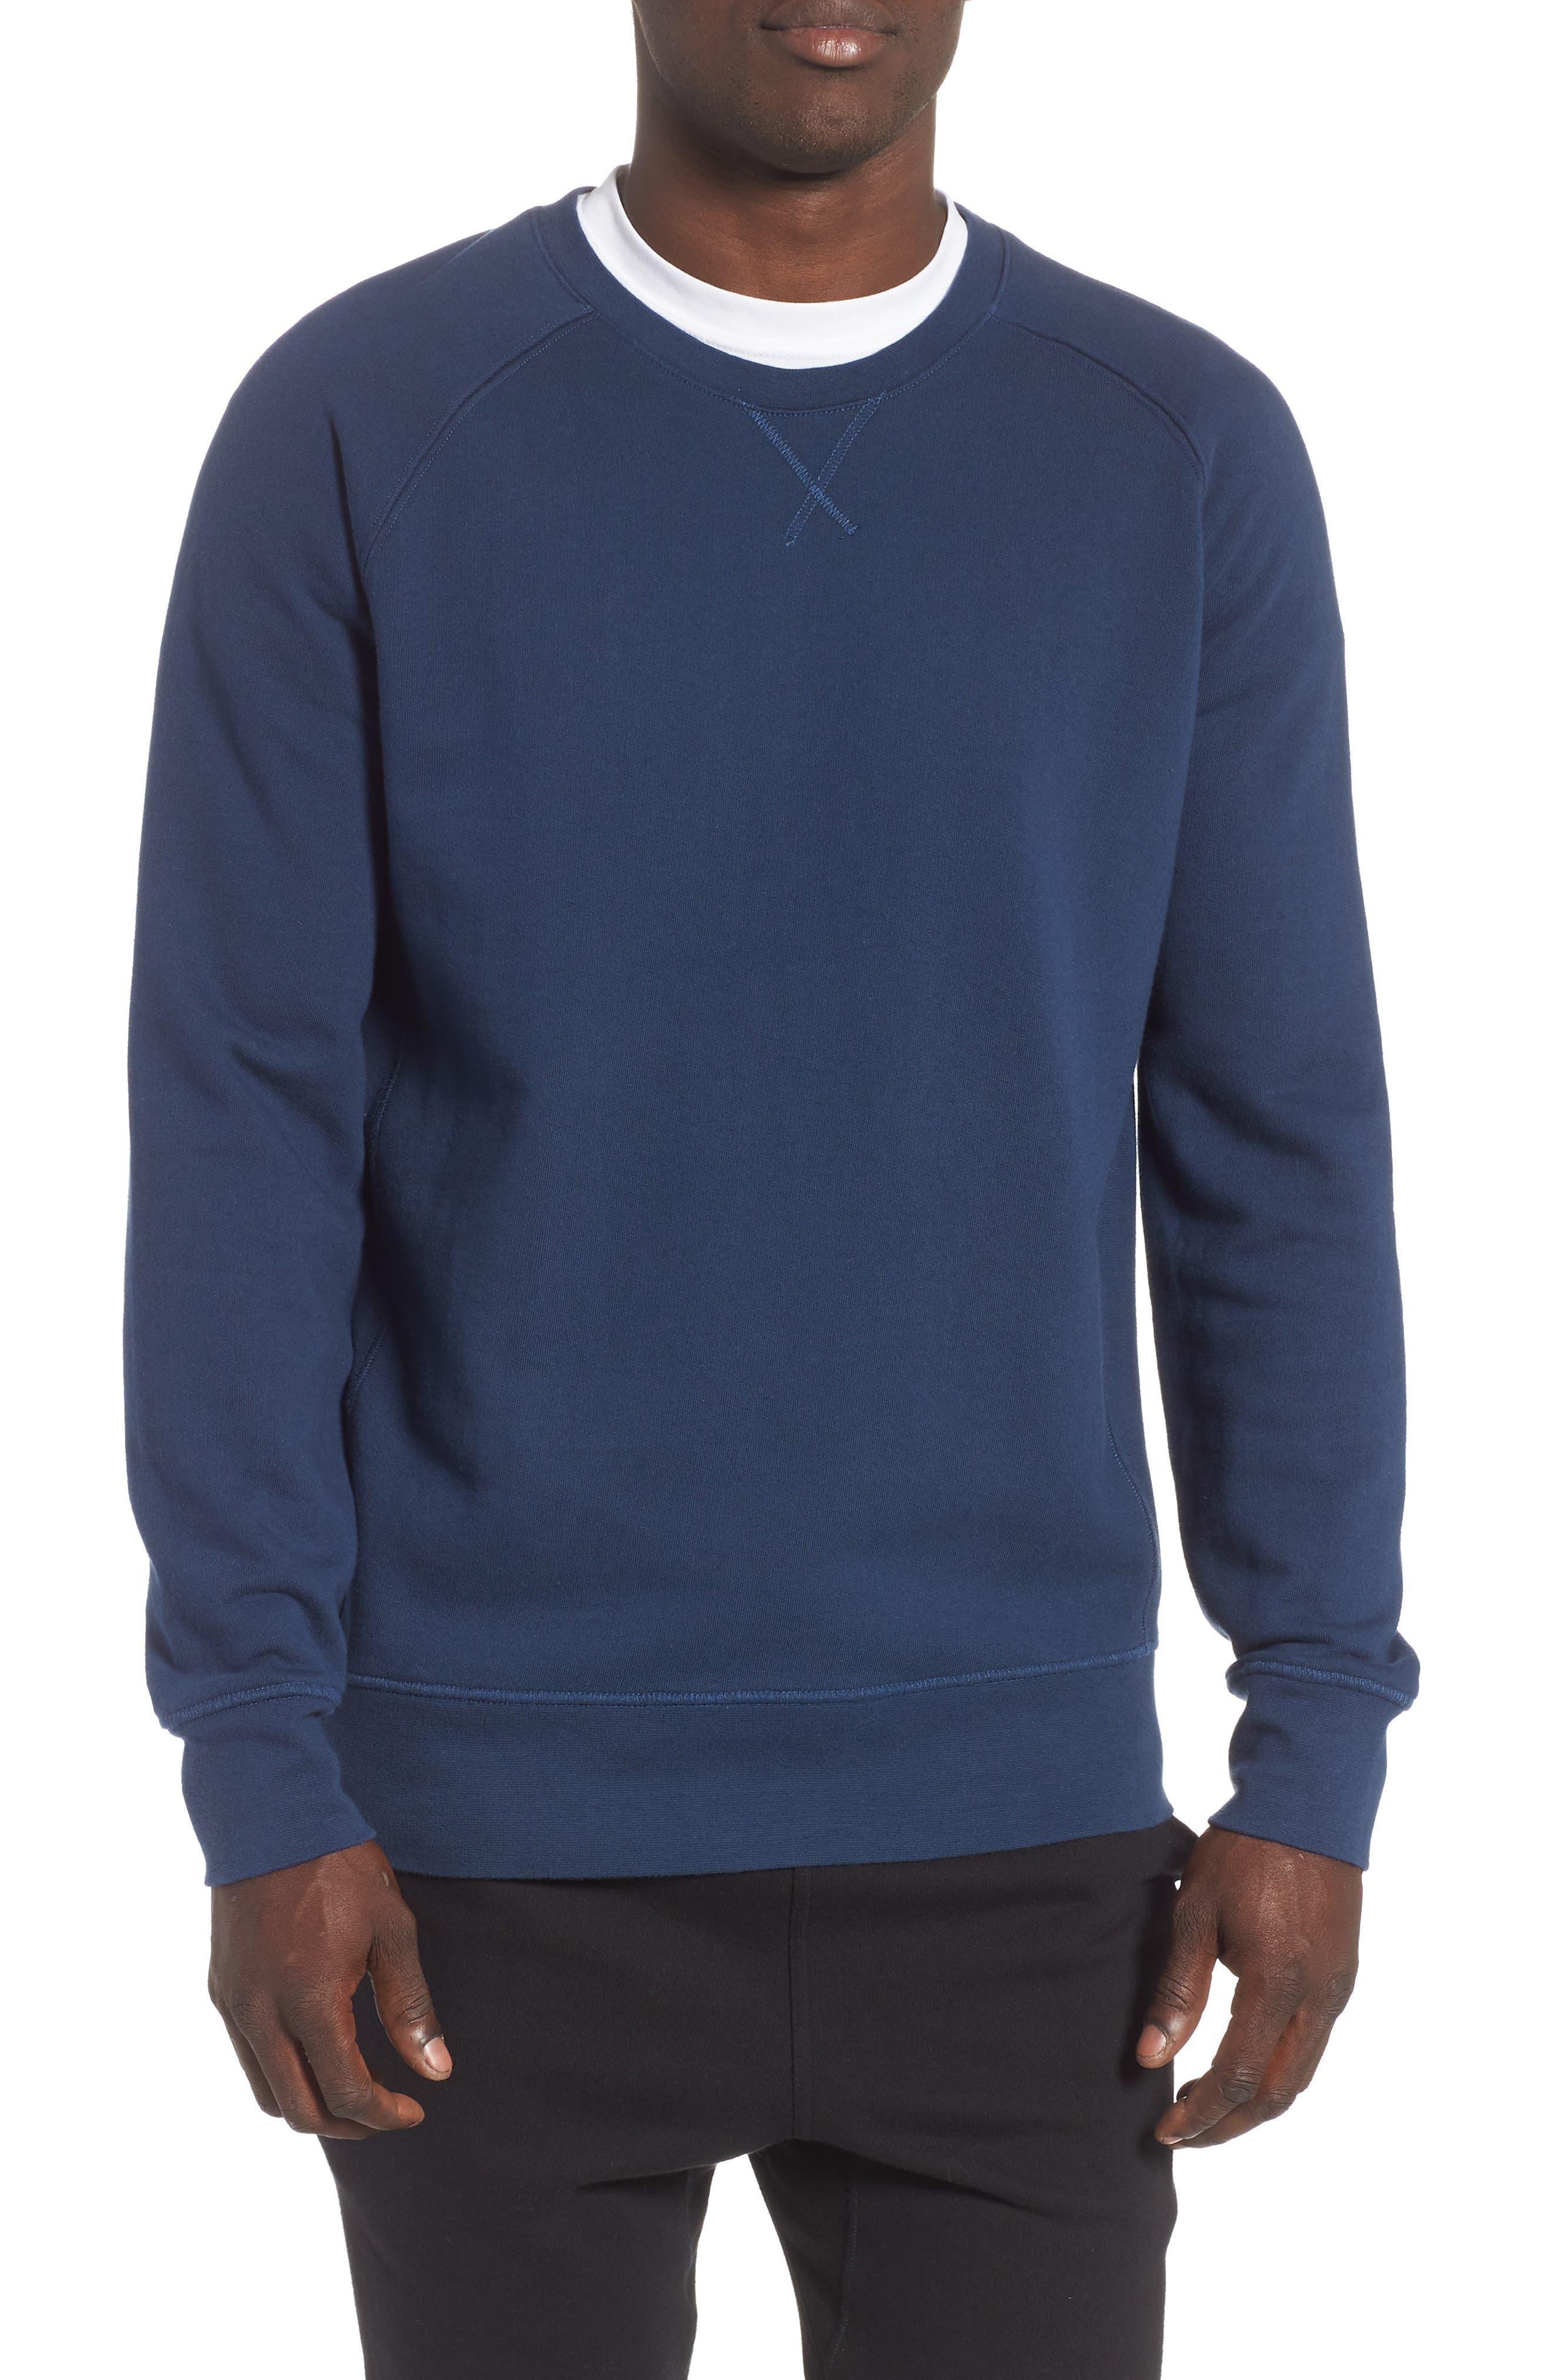 RICHER POORER Crewneck Cotton Sweatshirt in Navy